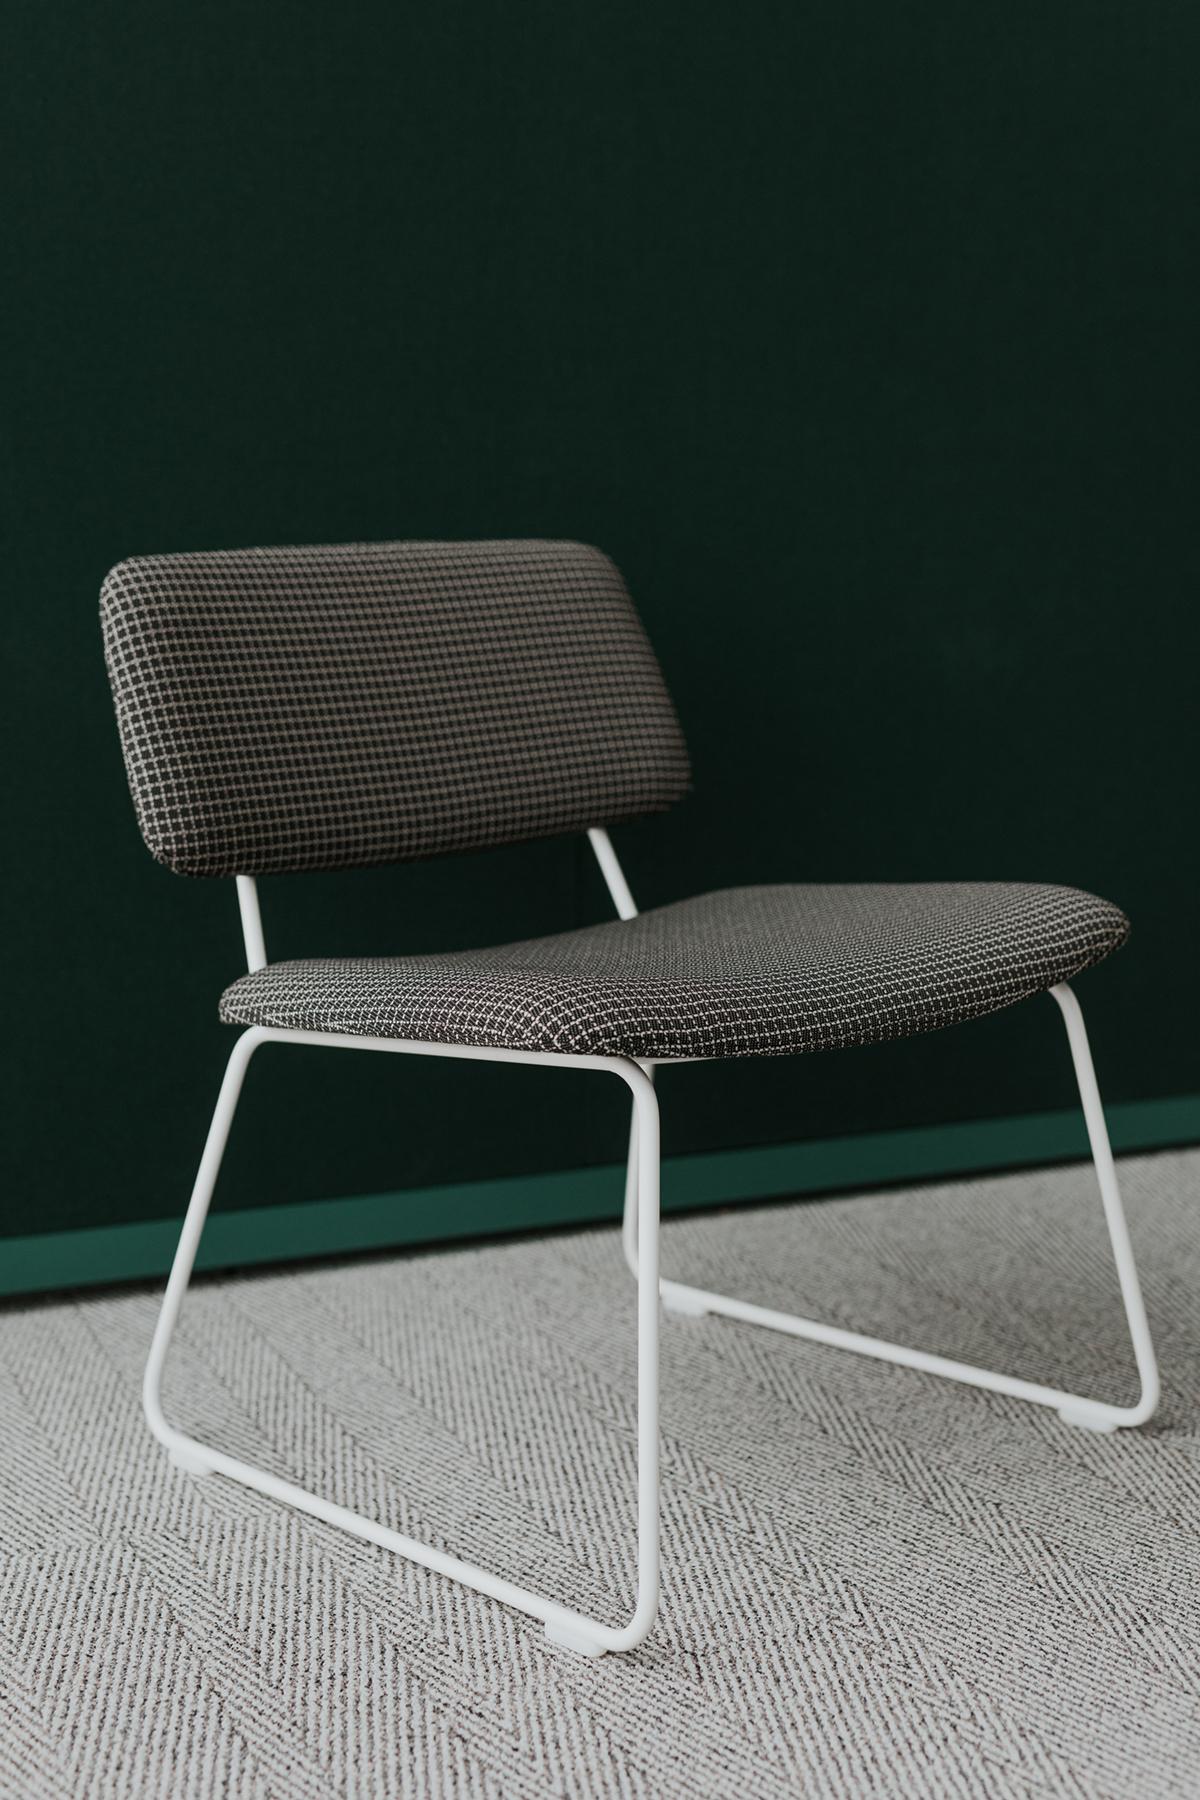 Seating: Haworth Resonate